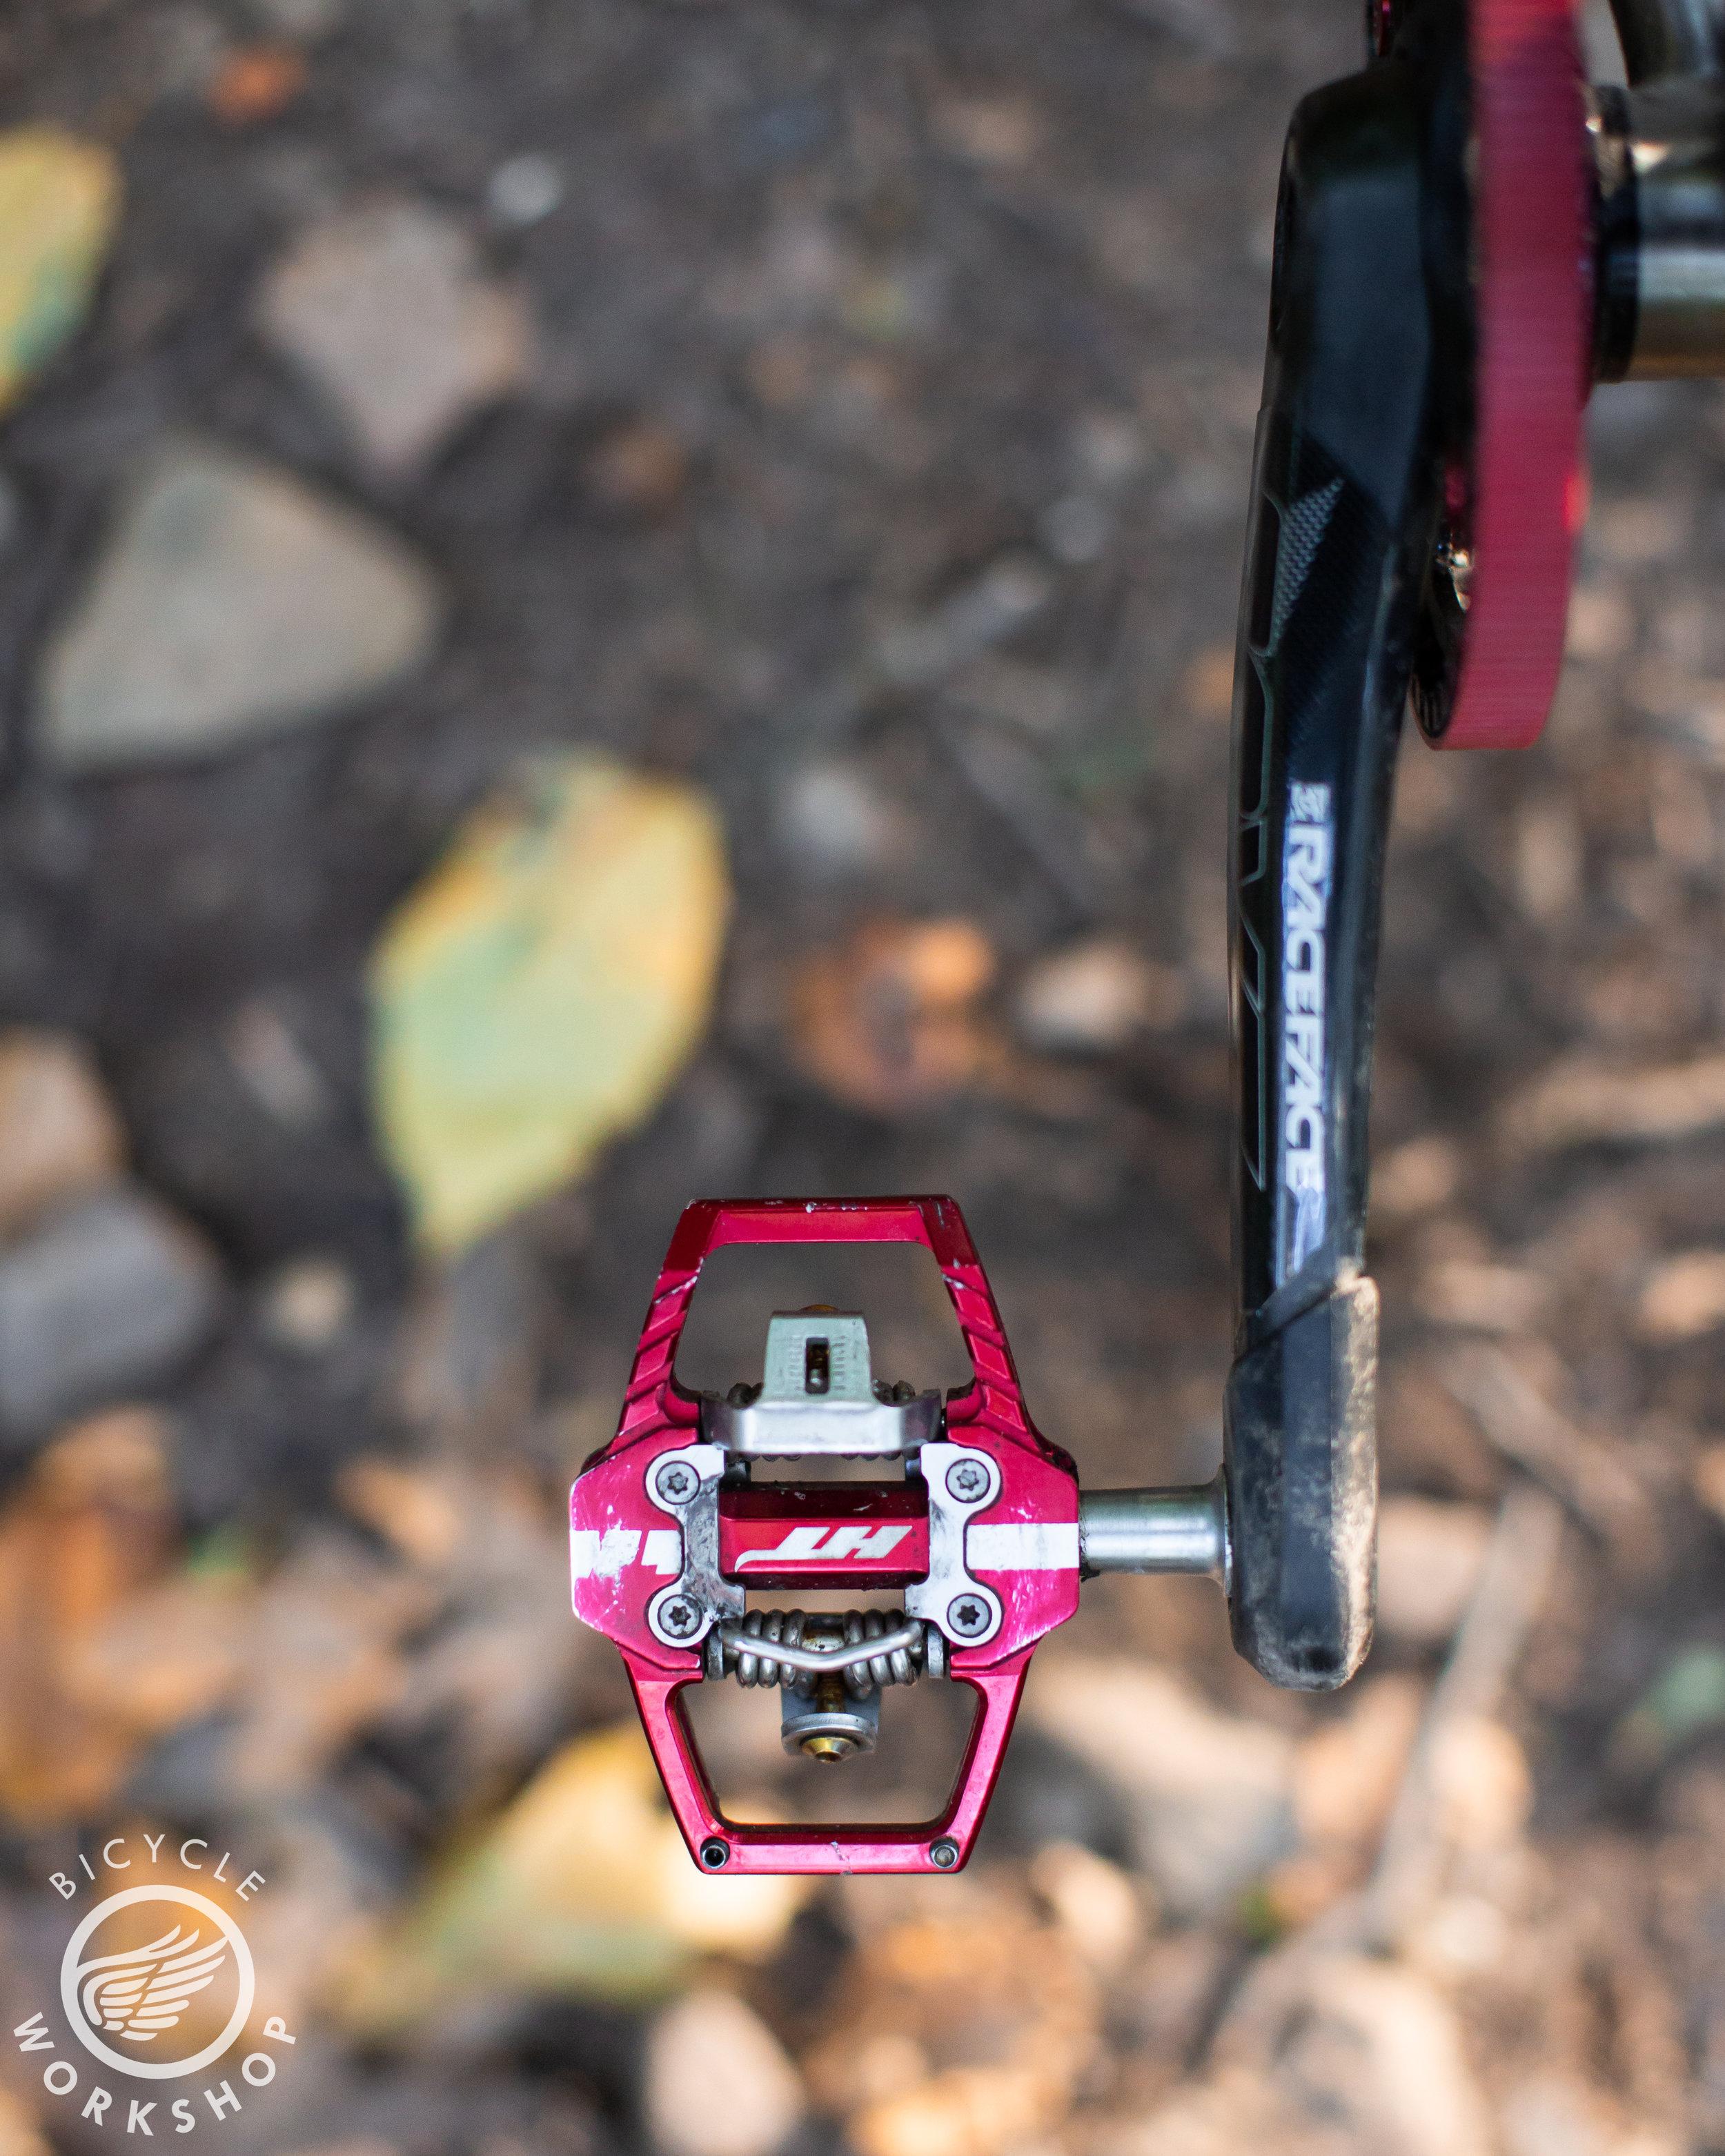 HT pedals with Raceface Next-R cranks